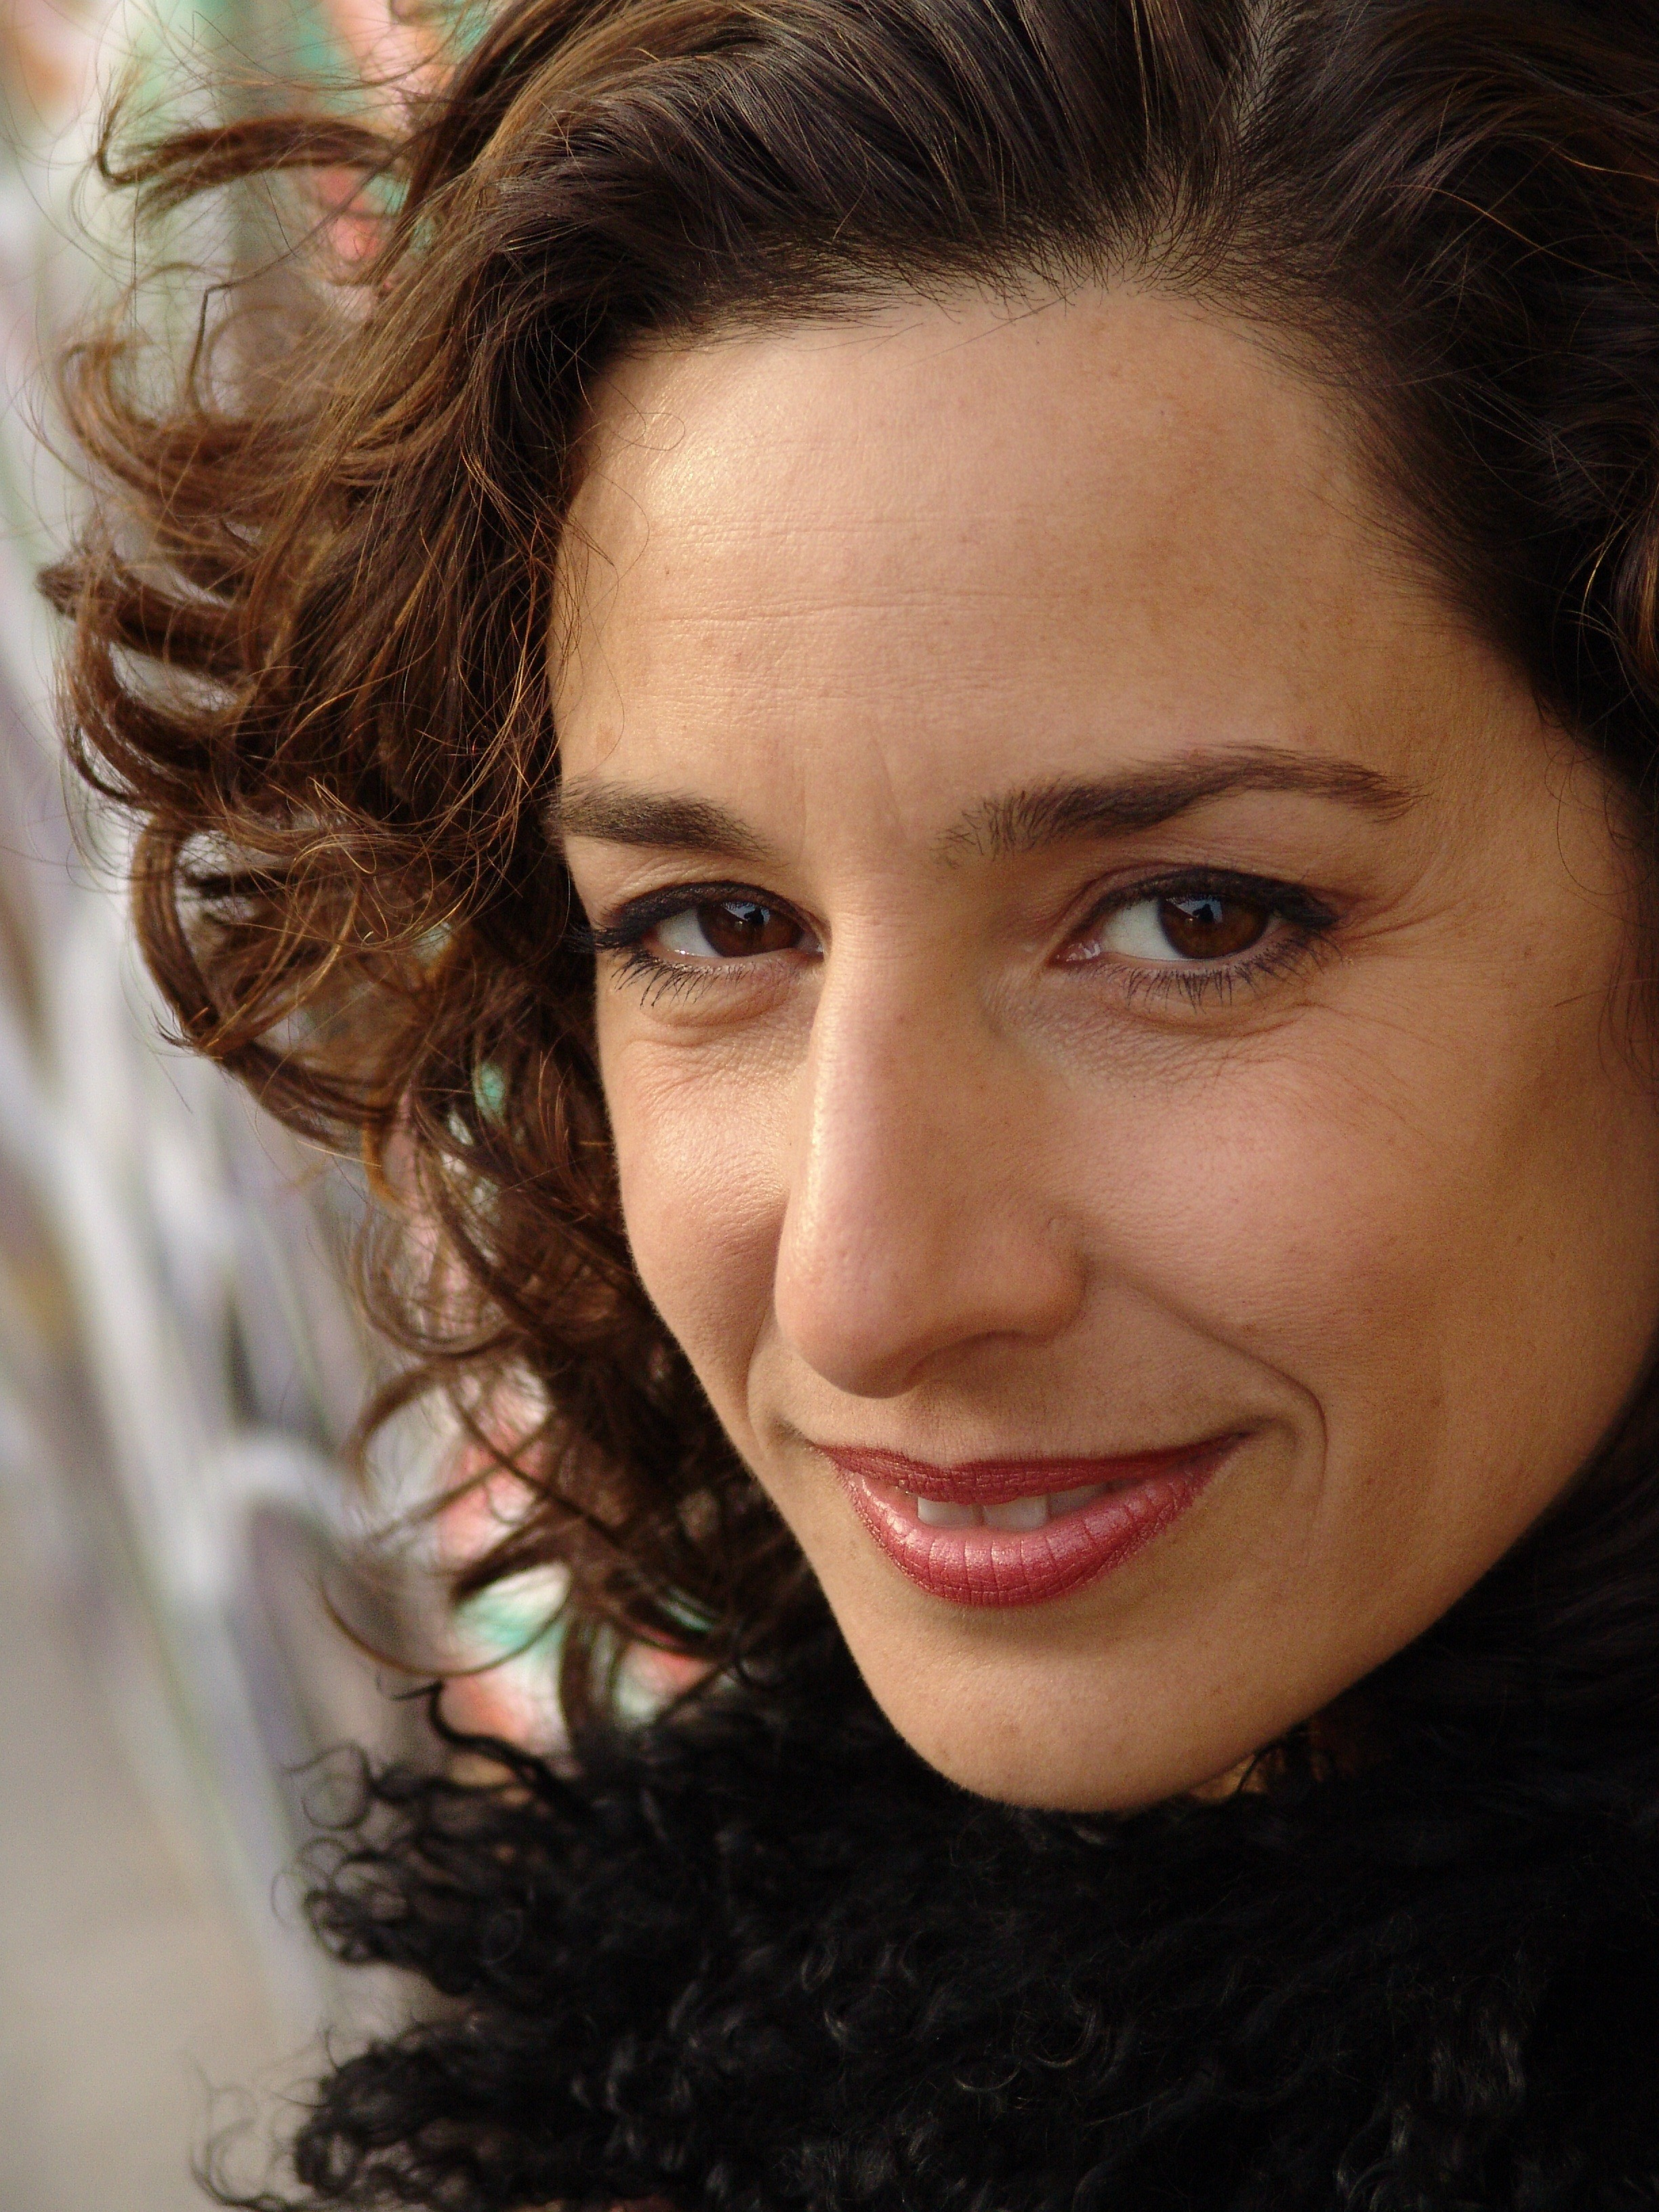 bcedcddba2af3a5ce688_Nancy-Turano-Headshot-.jpg